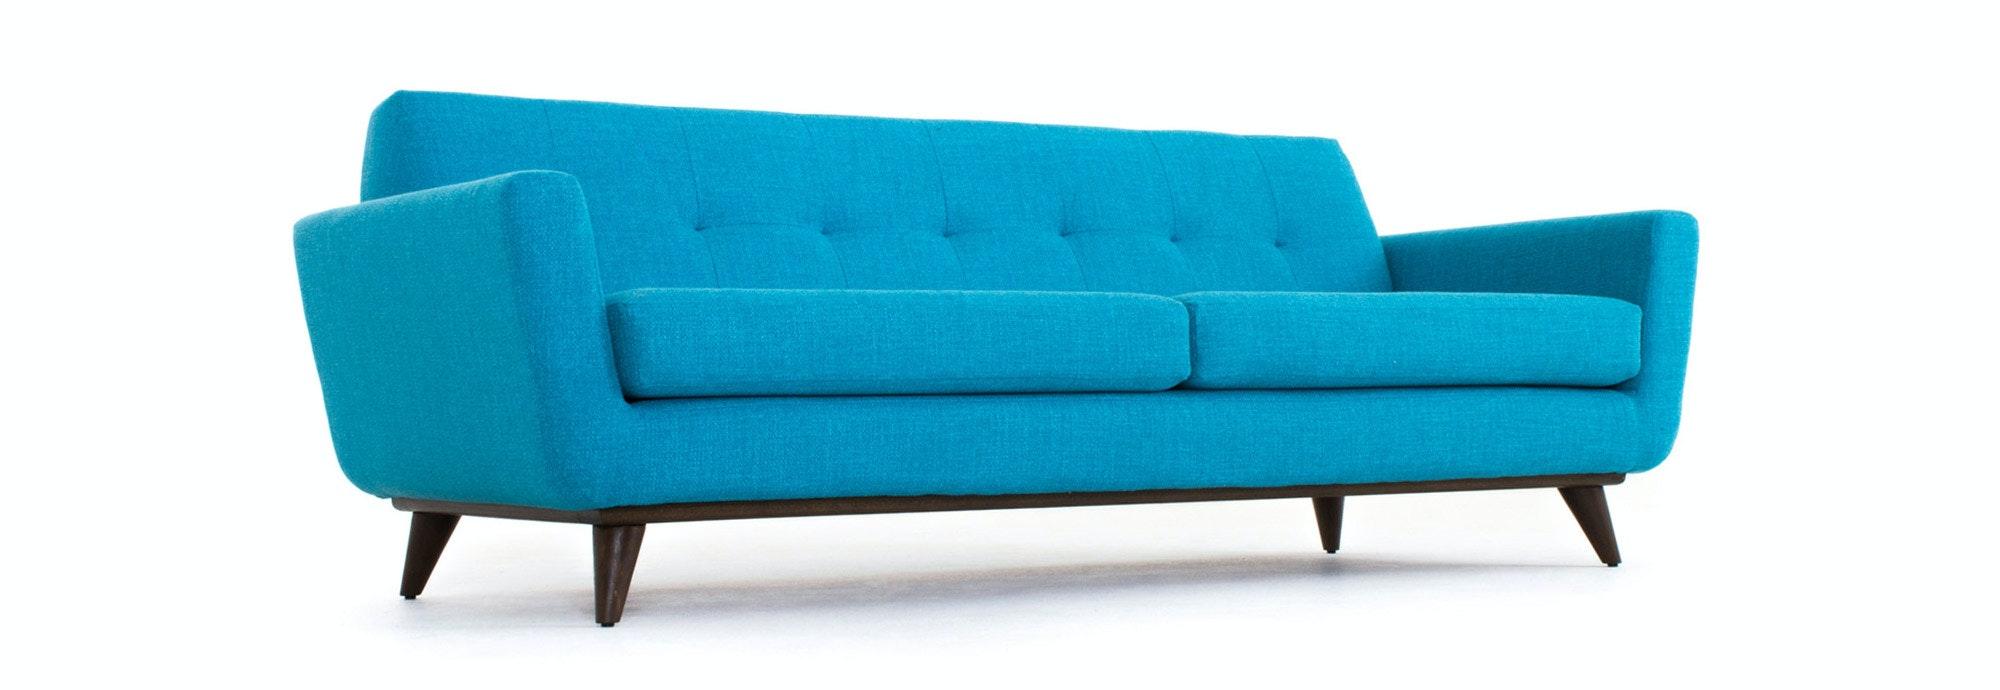 aqua sofa pottery barn sofas quality hughes joybird the ultimate showpiece